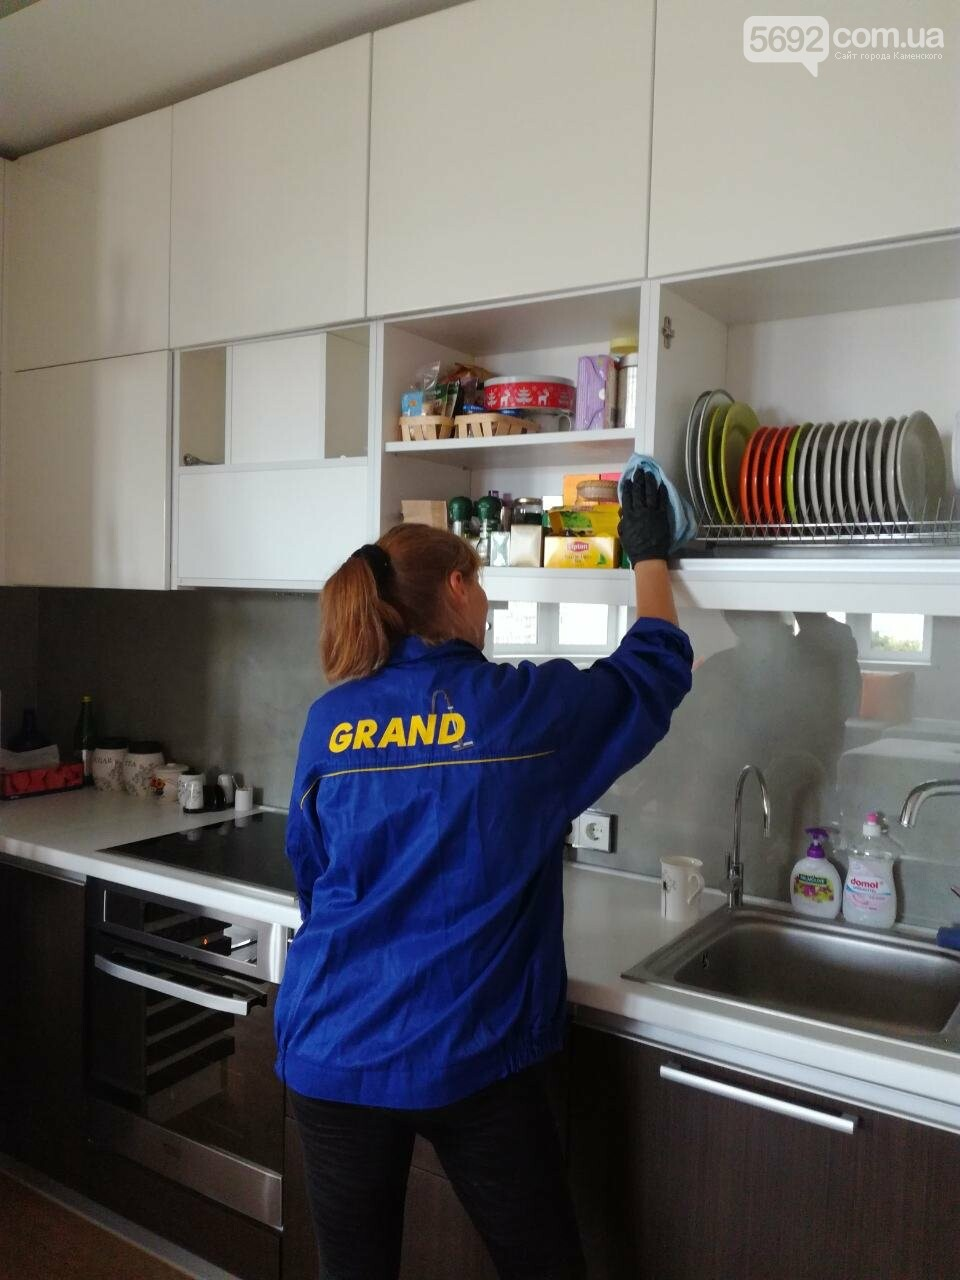 Качественная уборка дома, квартиры, офиса, фото-3